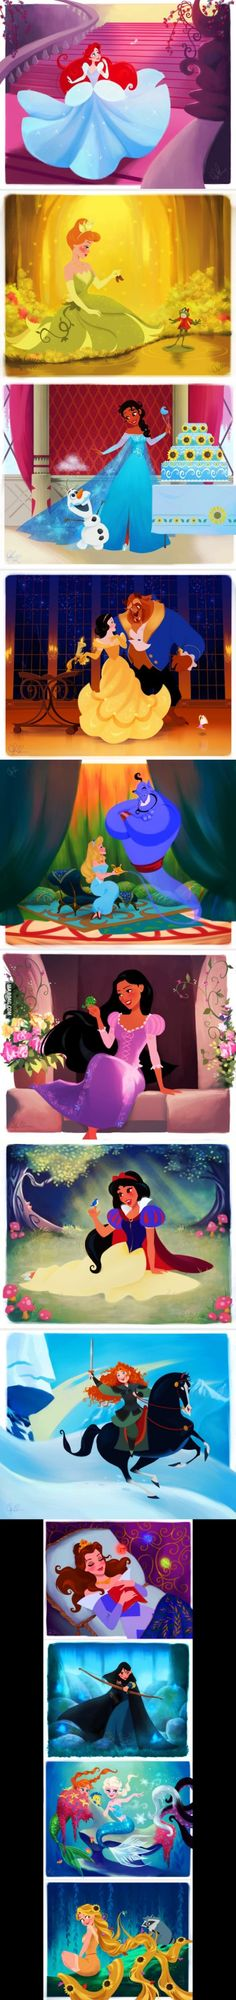 Disney Princesses dressed as other Disney Princesses - 9GAG by linda